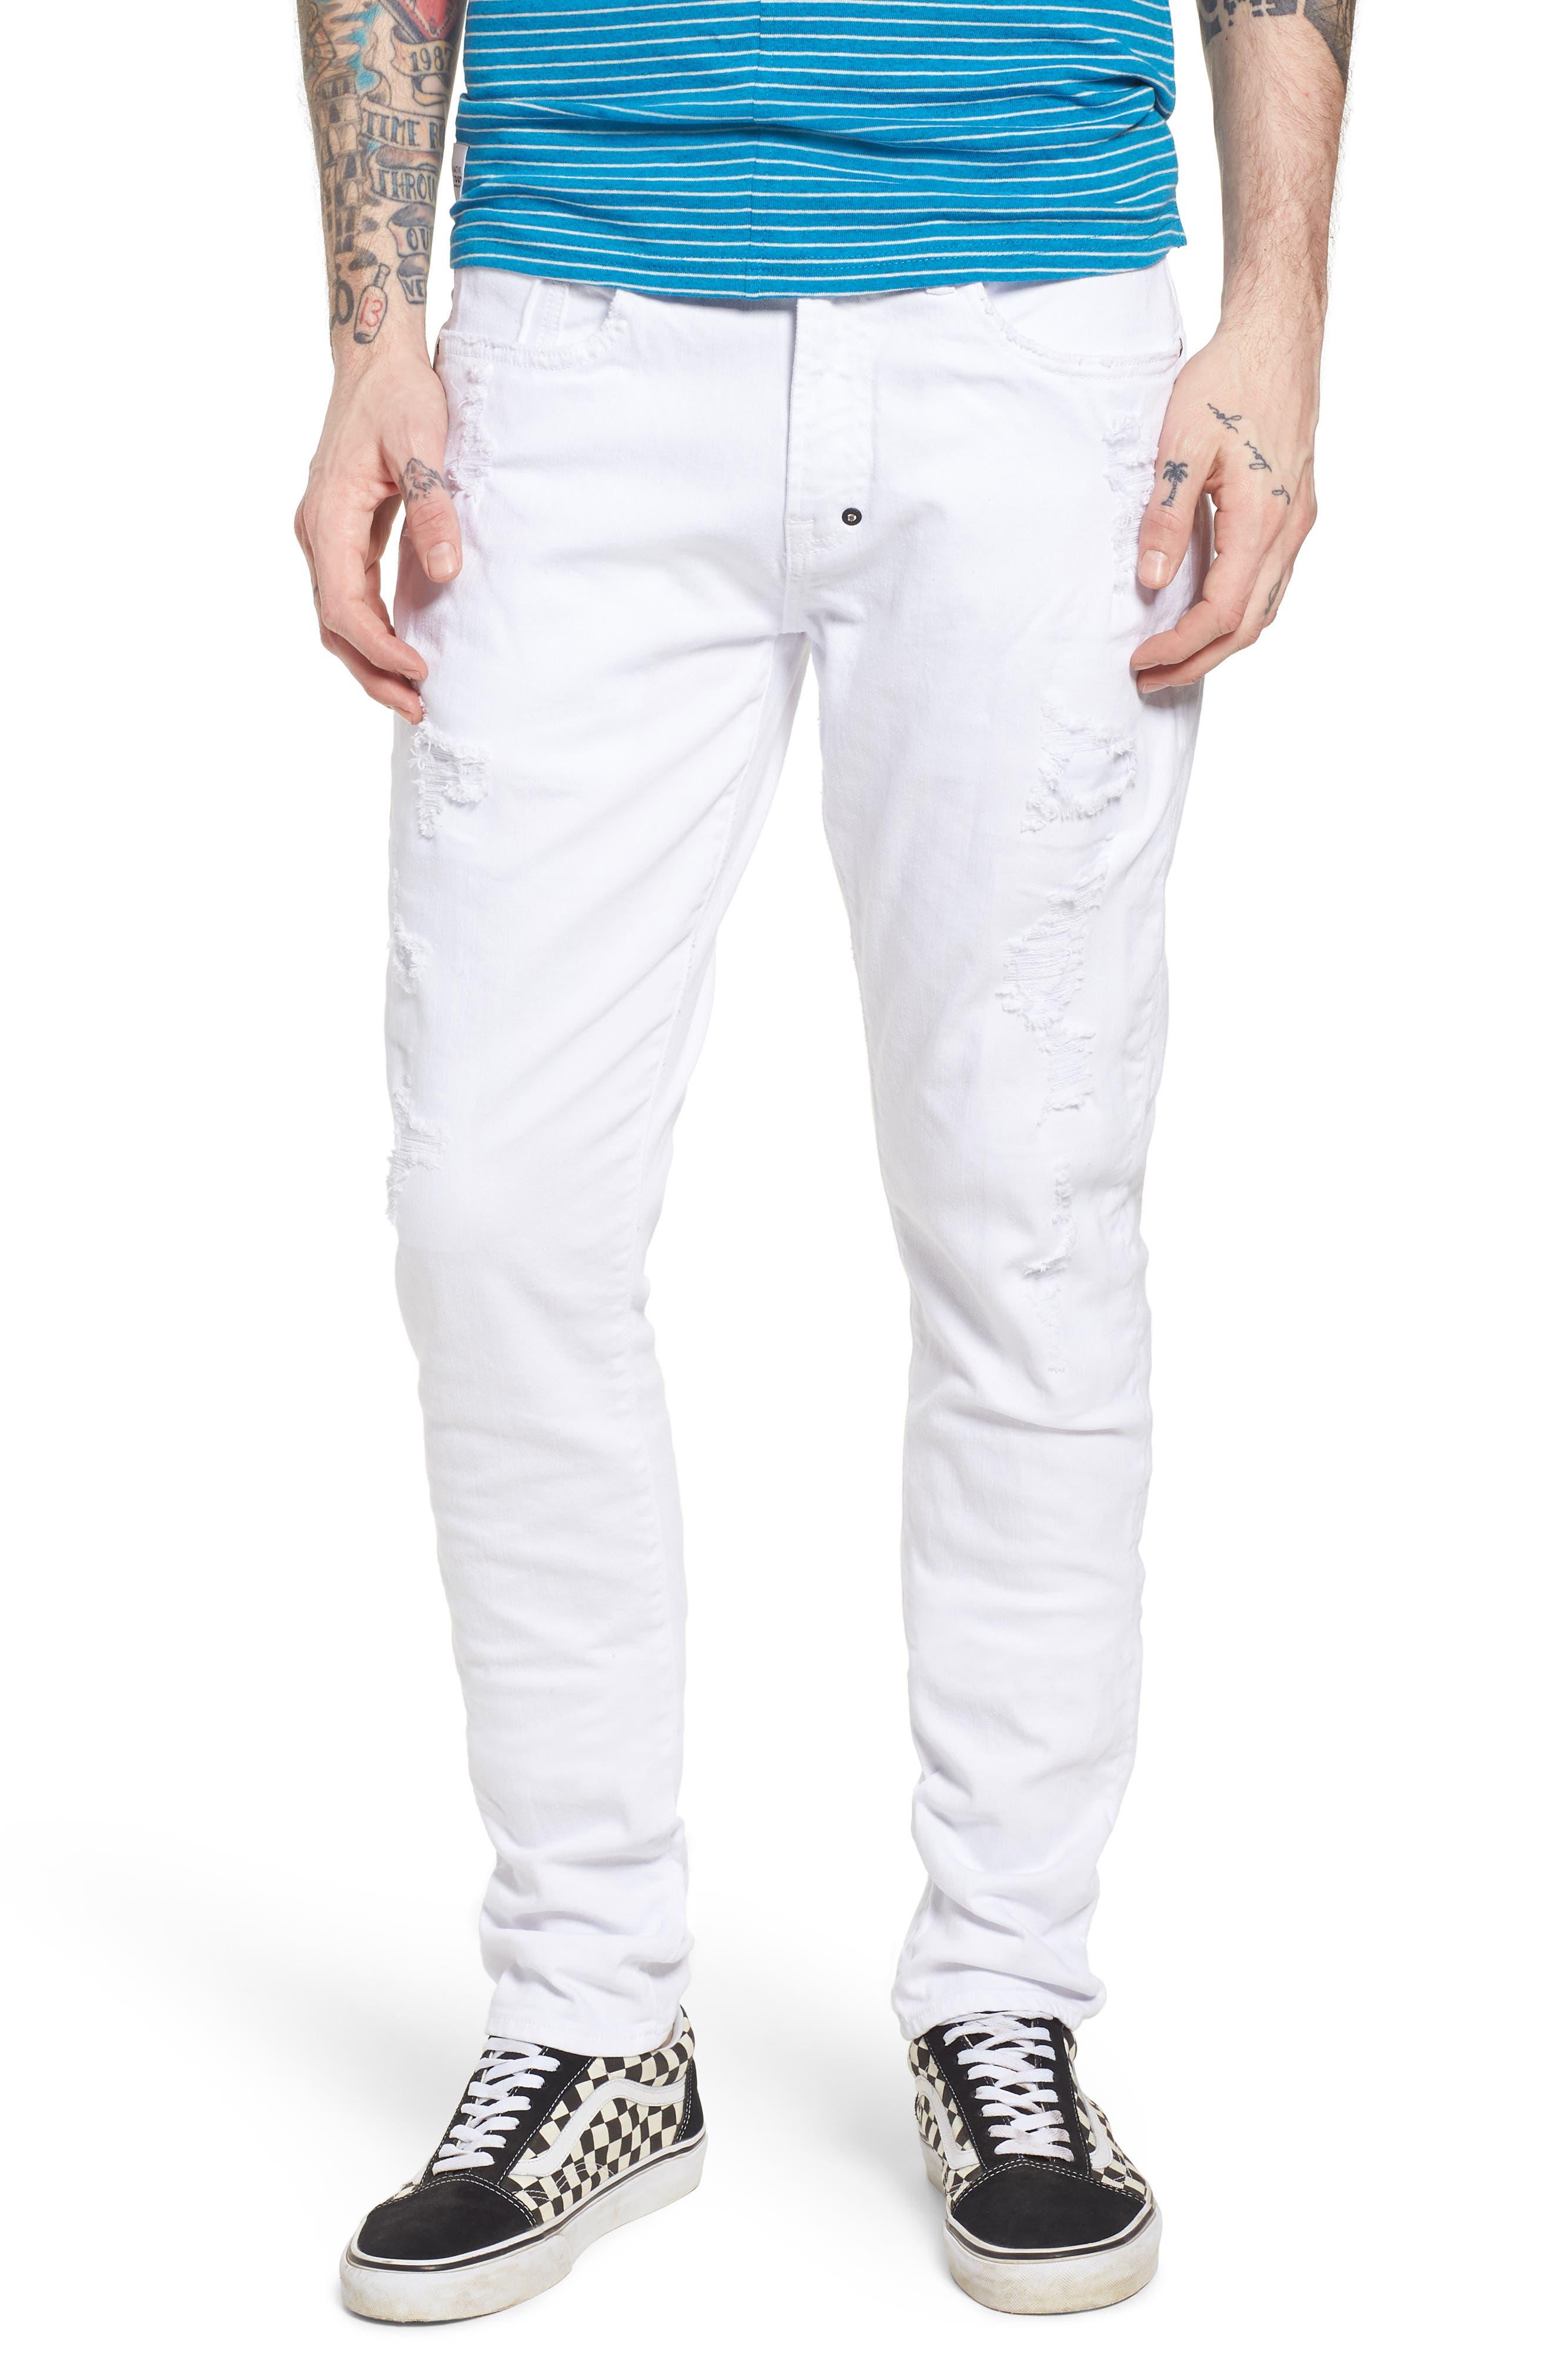 Windsor Slim Fit Jeans,                             Main thumbnail 1, color,                             100